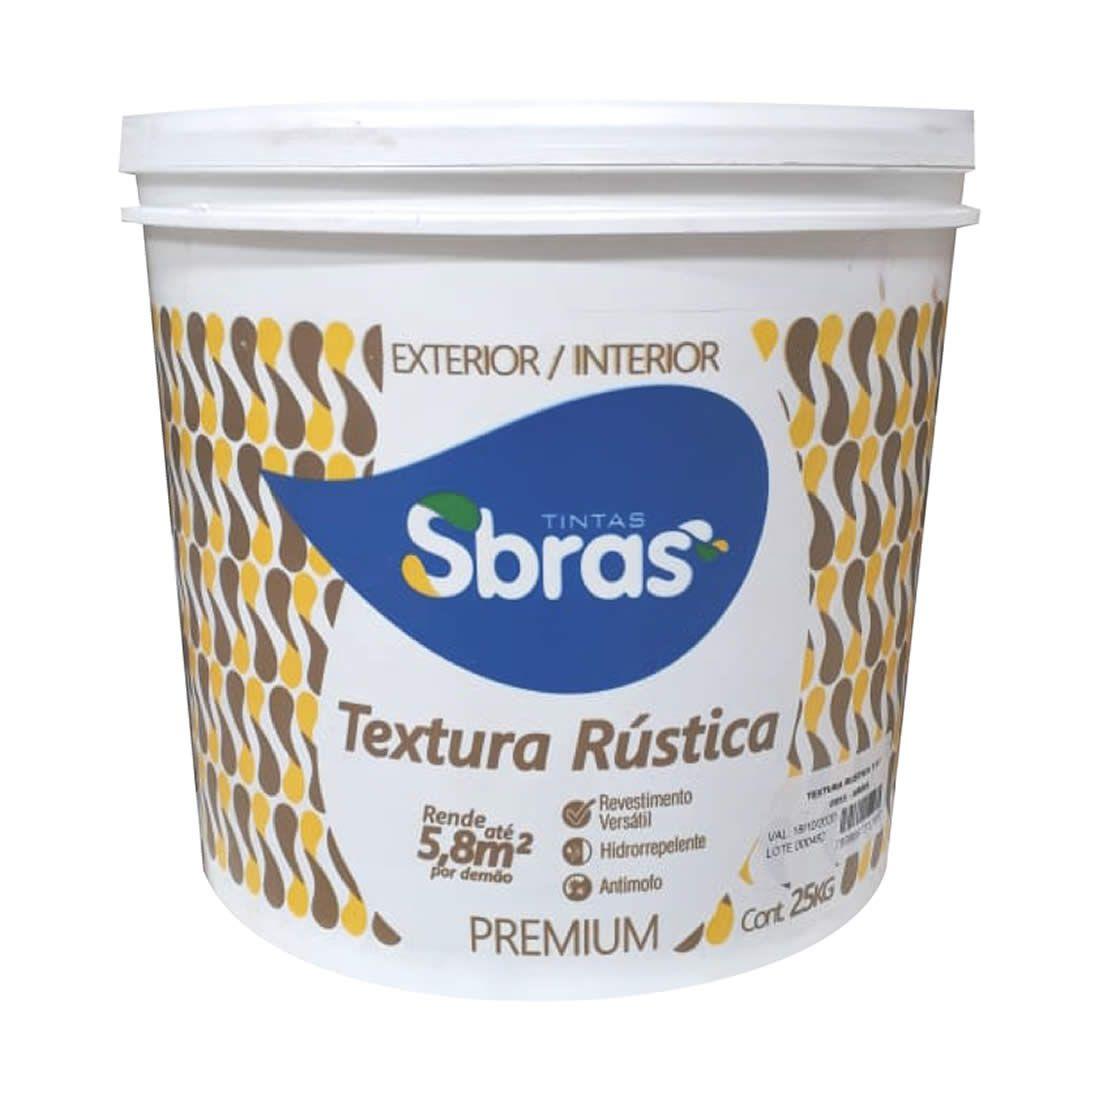 Textura Rústica Sbras Barcelona 25kg